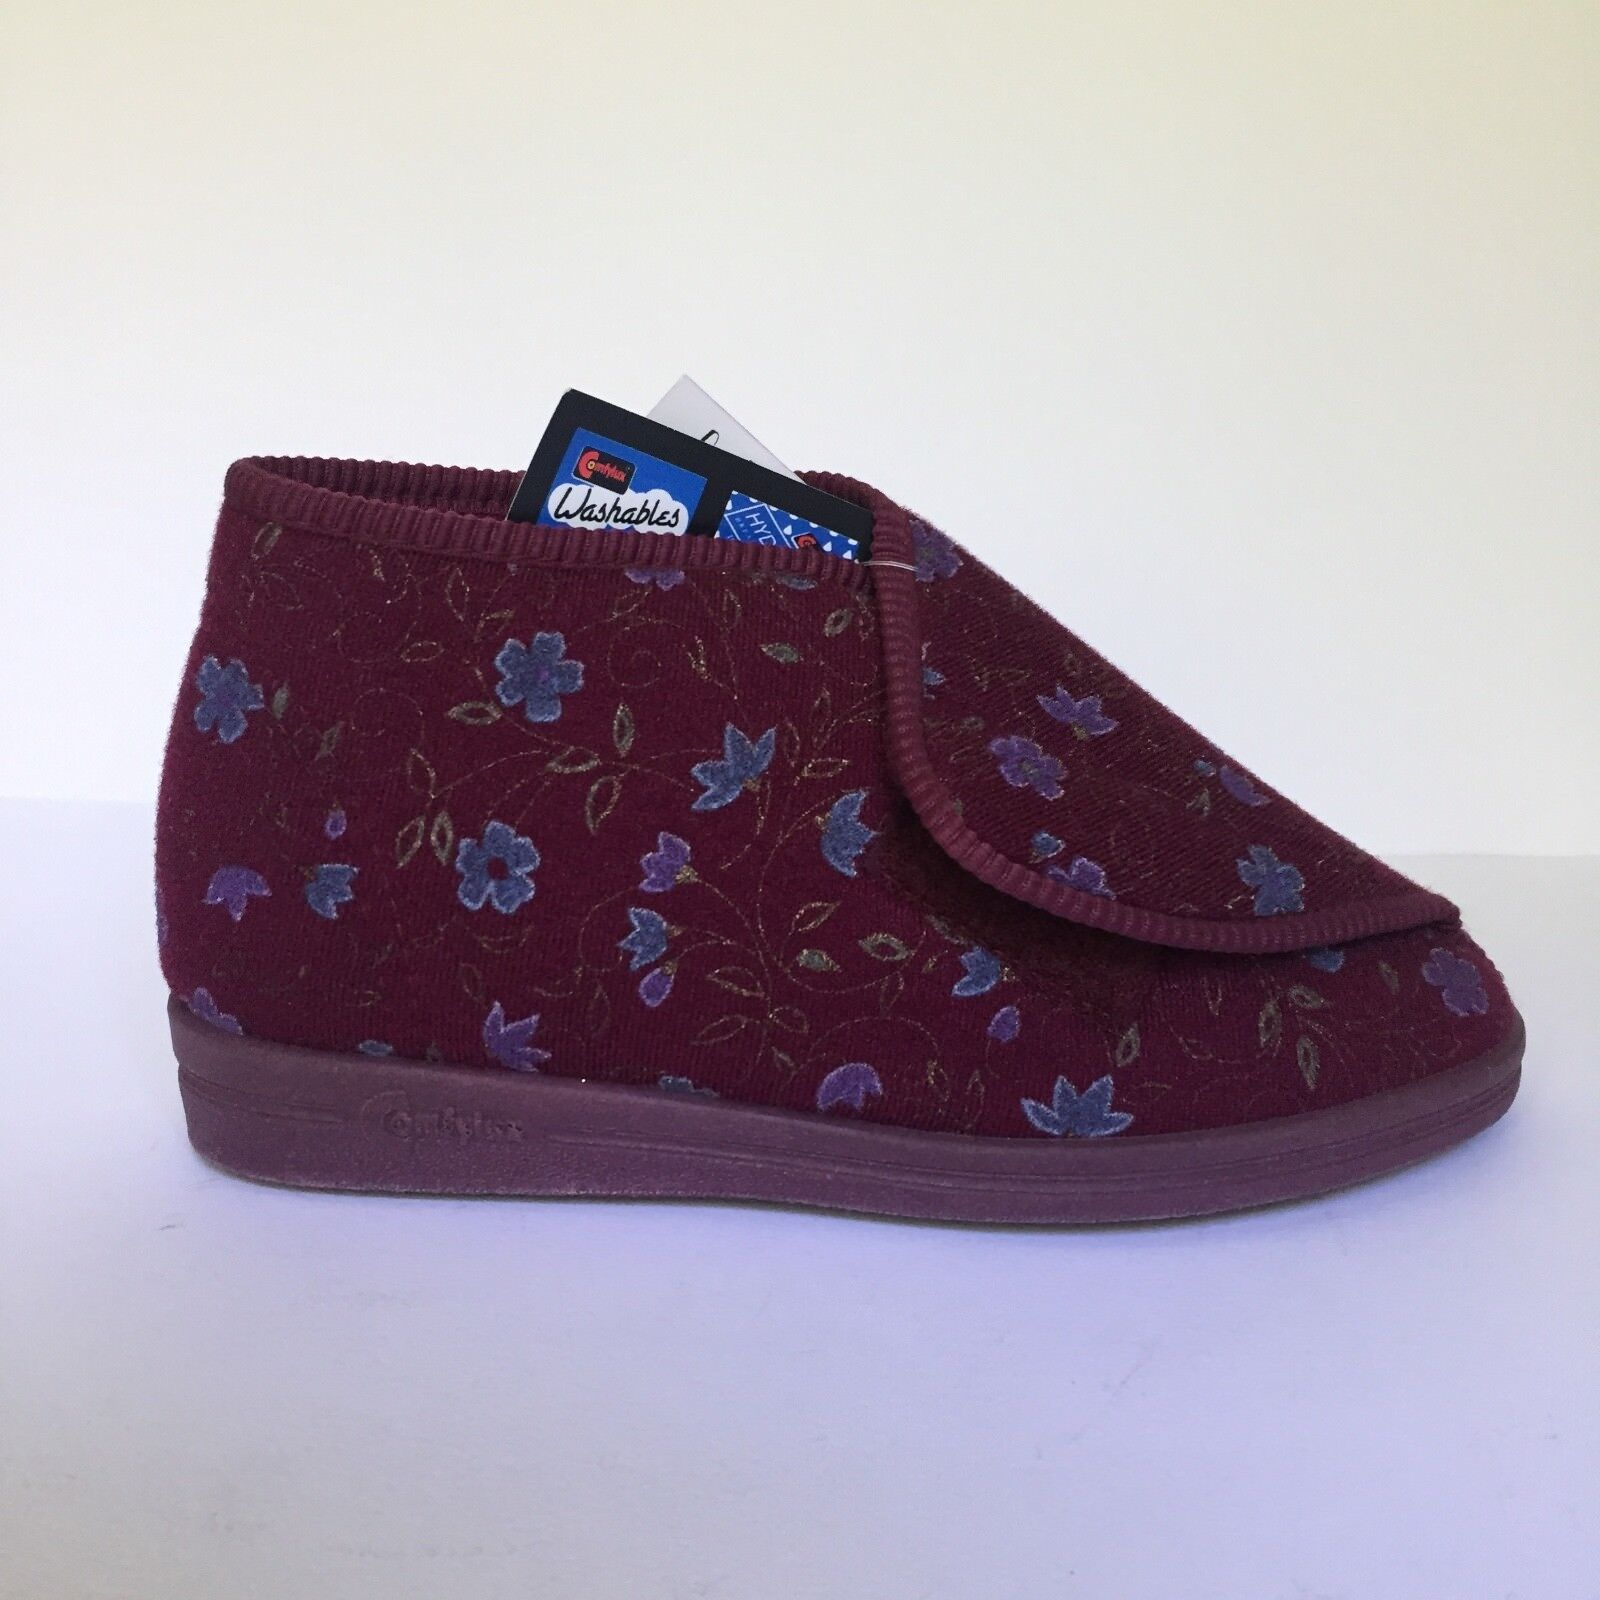 Comfylux Andrea Burgunday Red Floral Velcro Comfort Boot Slippers UK 4 EU 37